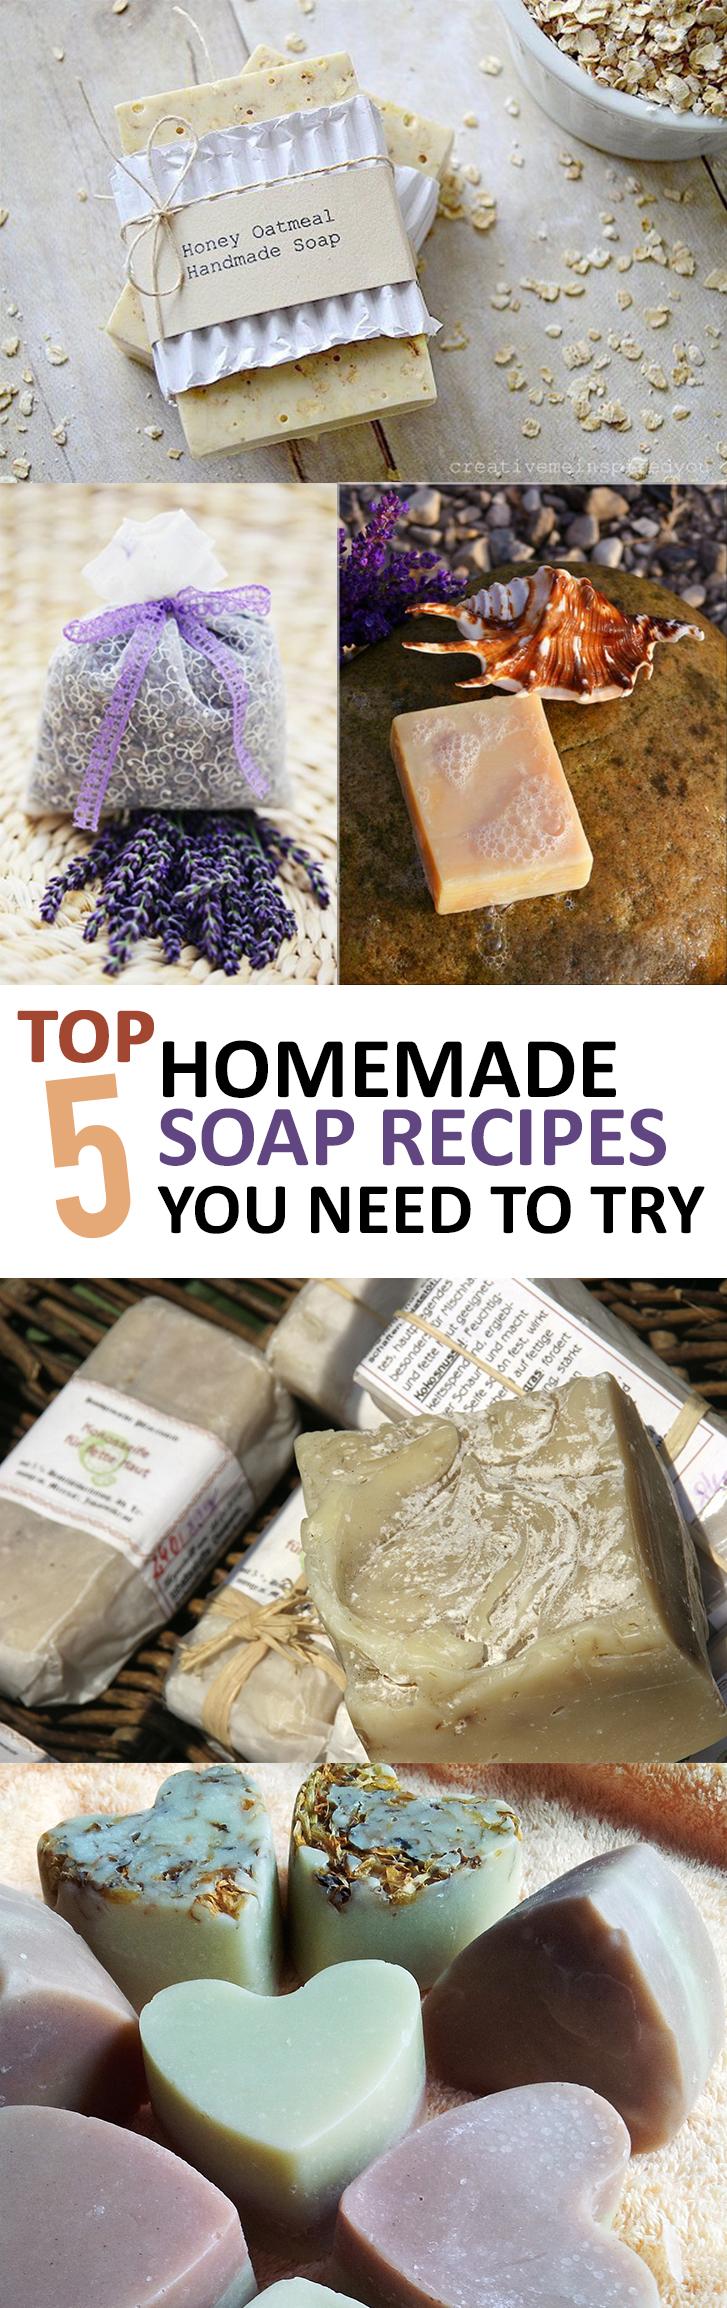 DIY soap, homemade soap, DIY soap recipes, natural beauty, popular pin, natural beauty projects, projects, beauty projects.